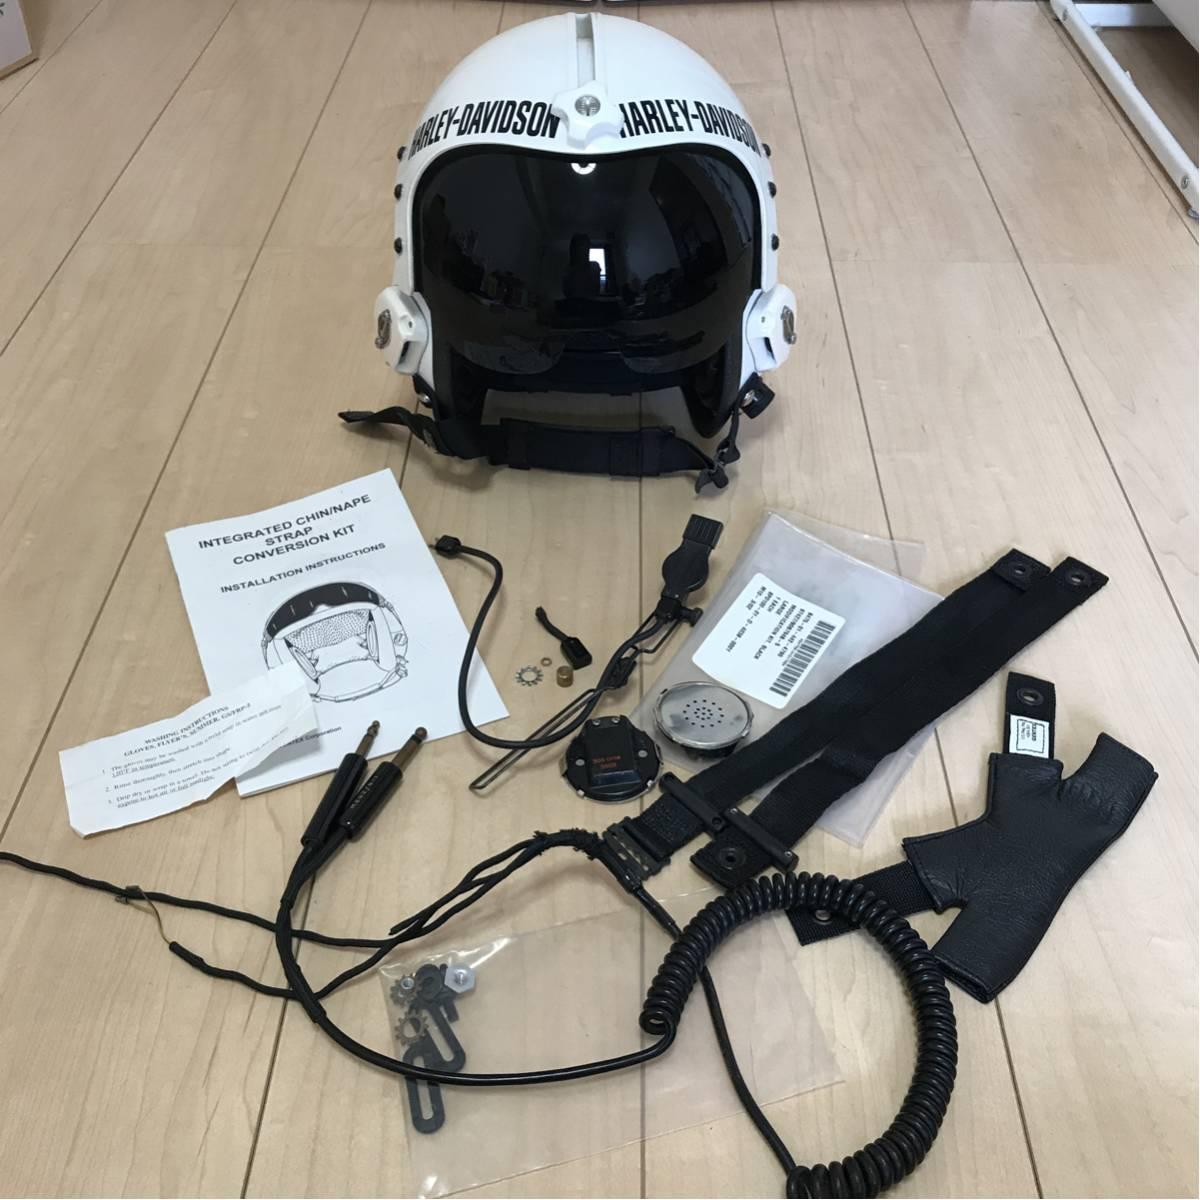 Gentex HGU-33 フライトヘルメット 本物 付属品多数 送料無料 ハーレー